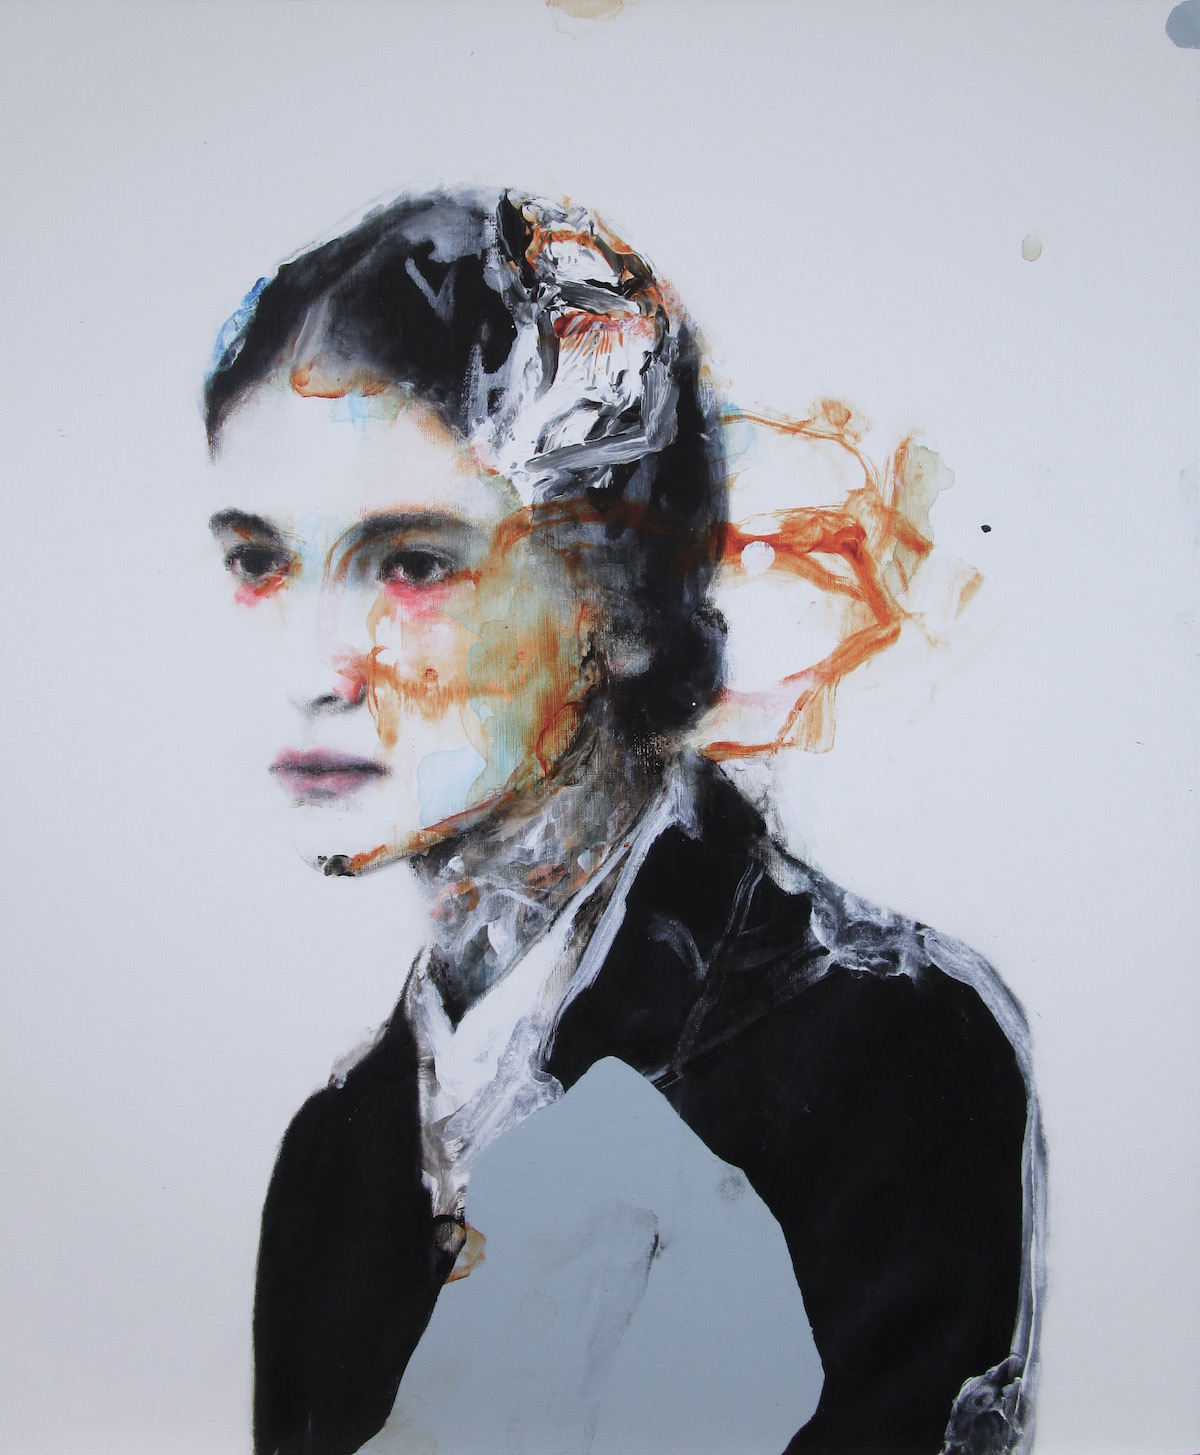 antoine cordet canvas toile peinture painting portrait art artist artiste peintre acrylic oil home run amnesia